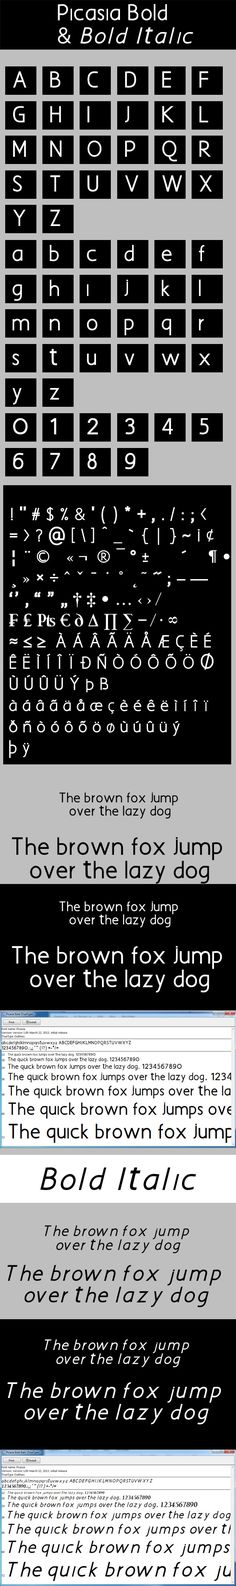 Picasia Bold & Picasia Bold Italic Fonts